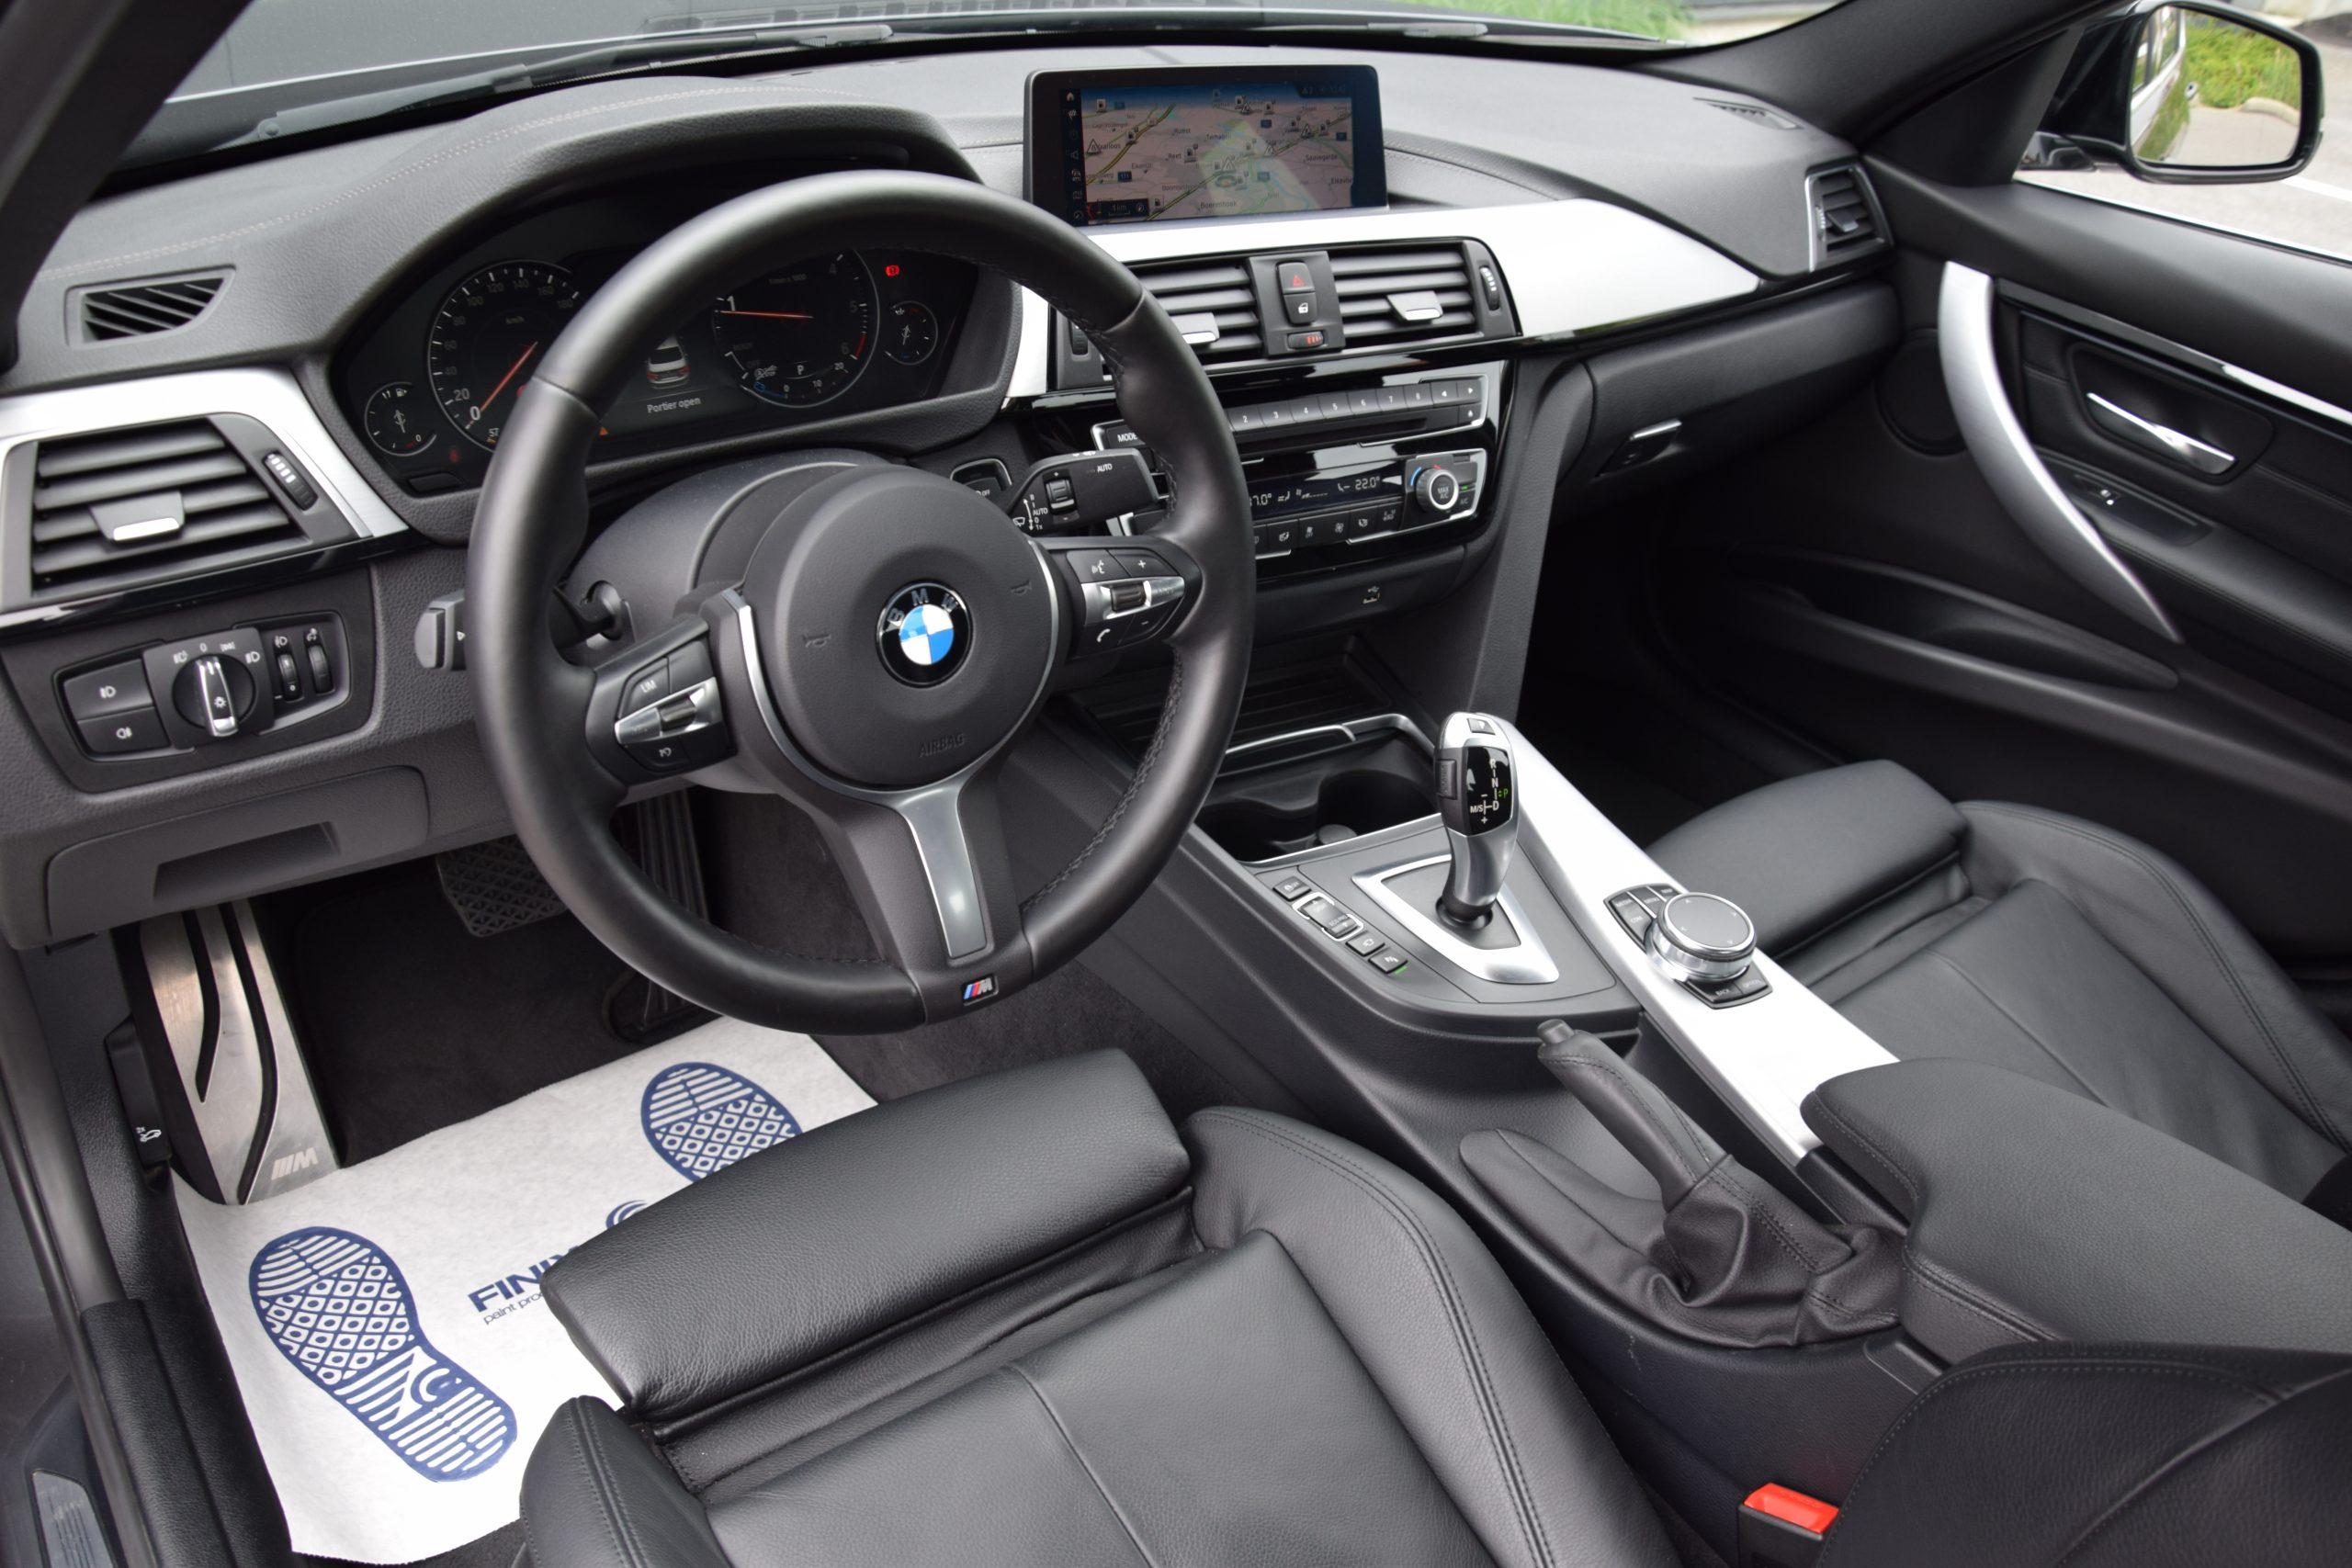 BMW 318 dA M-Sportpakket 05/2018 – Full Option – 37.000 km!!